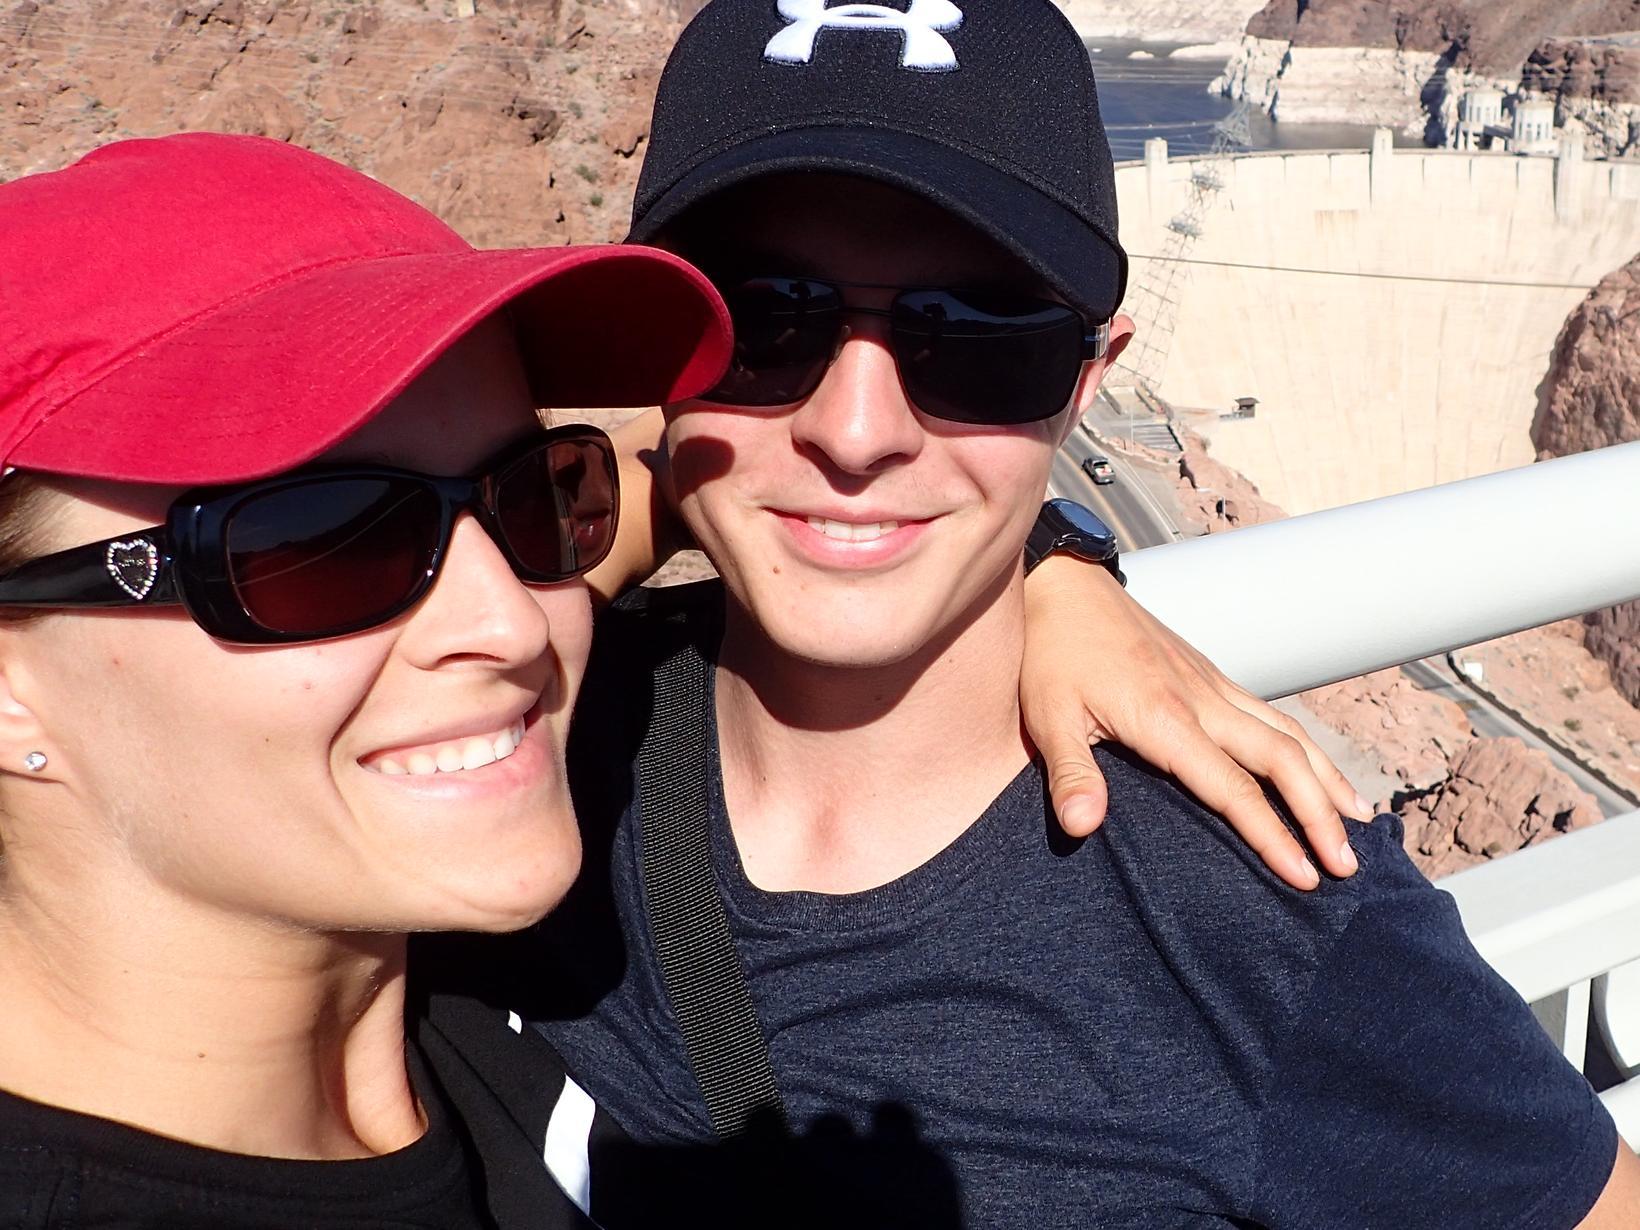 Marie & Lukas from Brno, Czech Republic